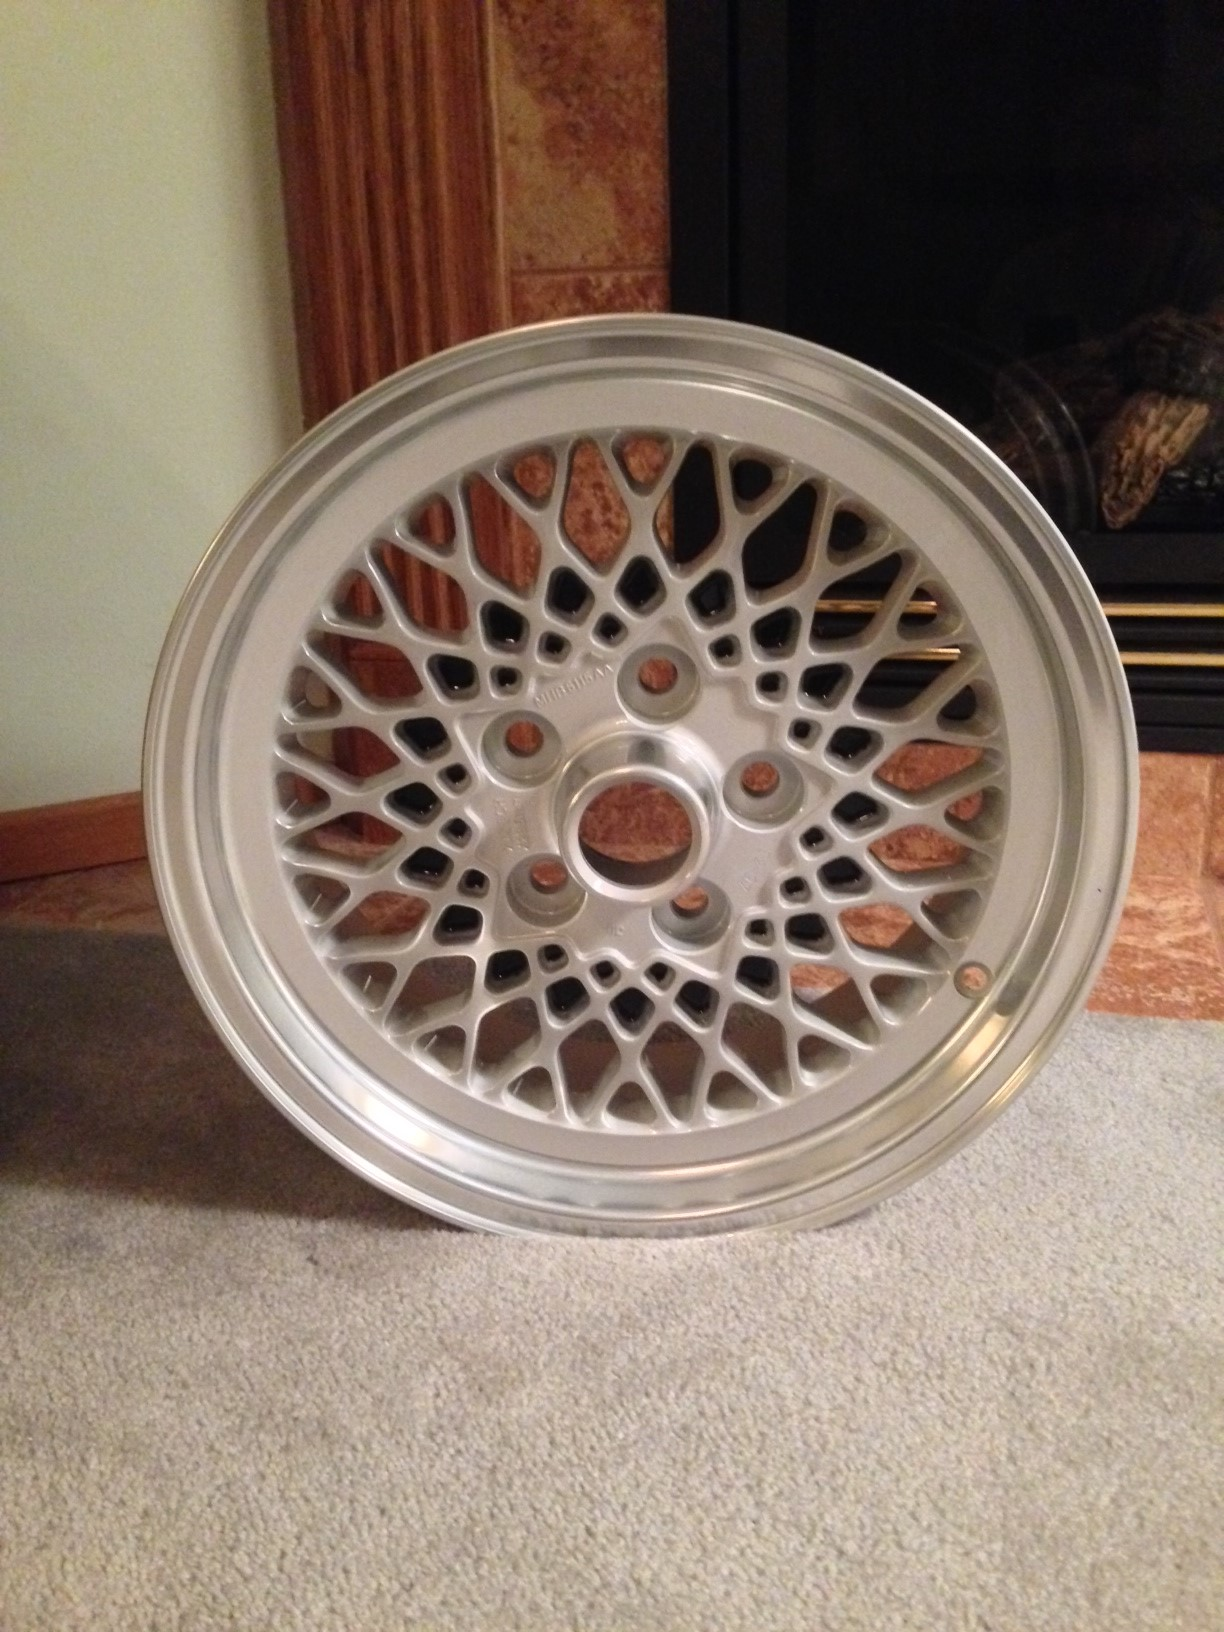 Xj6 Siii Wheel Fitment What Other Jaguar Wheels Fit